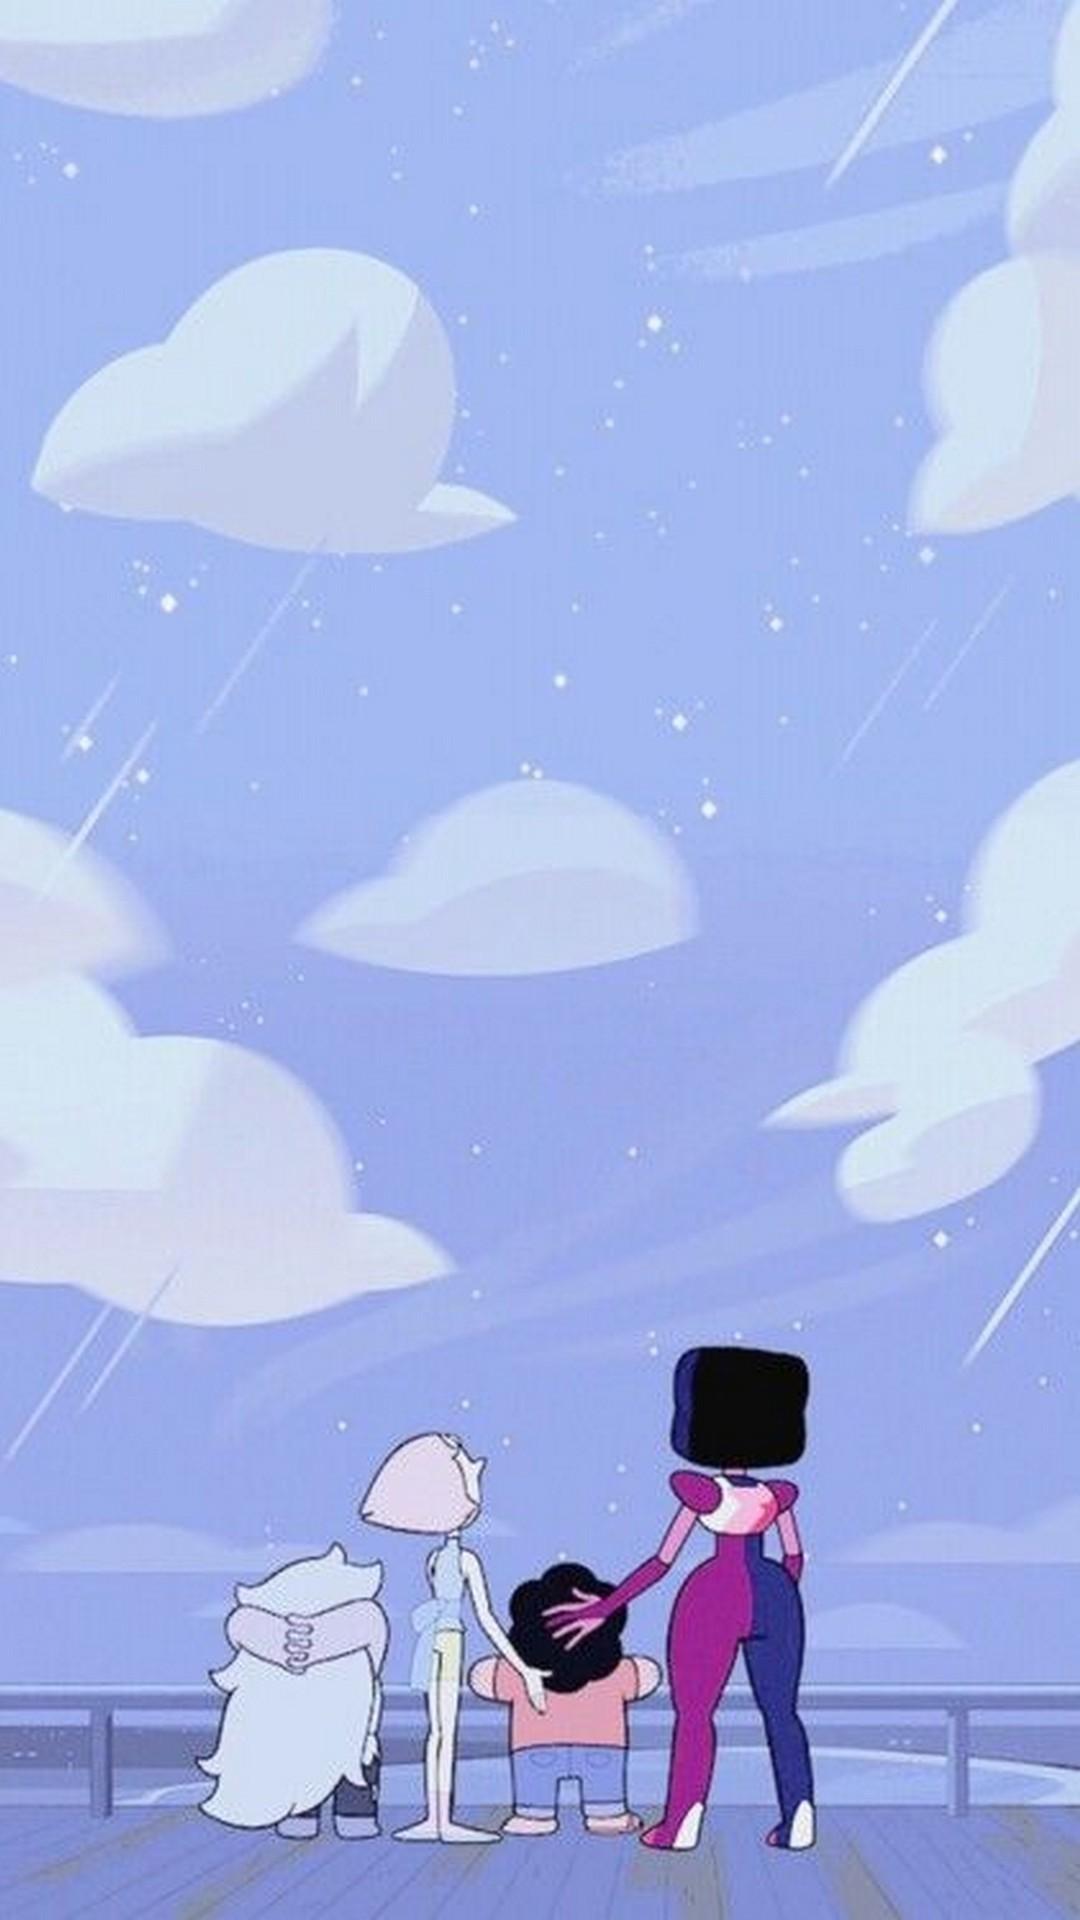 Steven Universe iPhone hd wallpaper